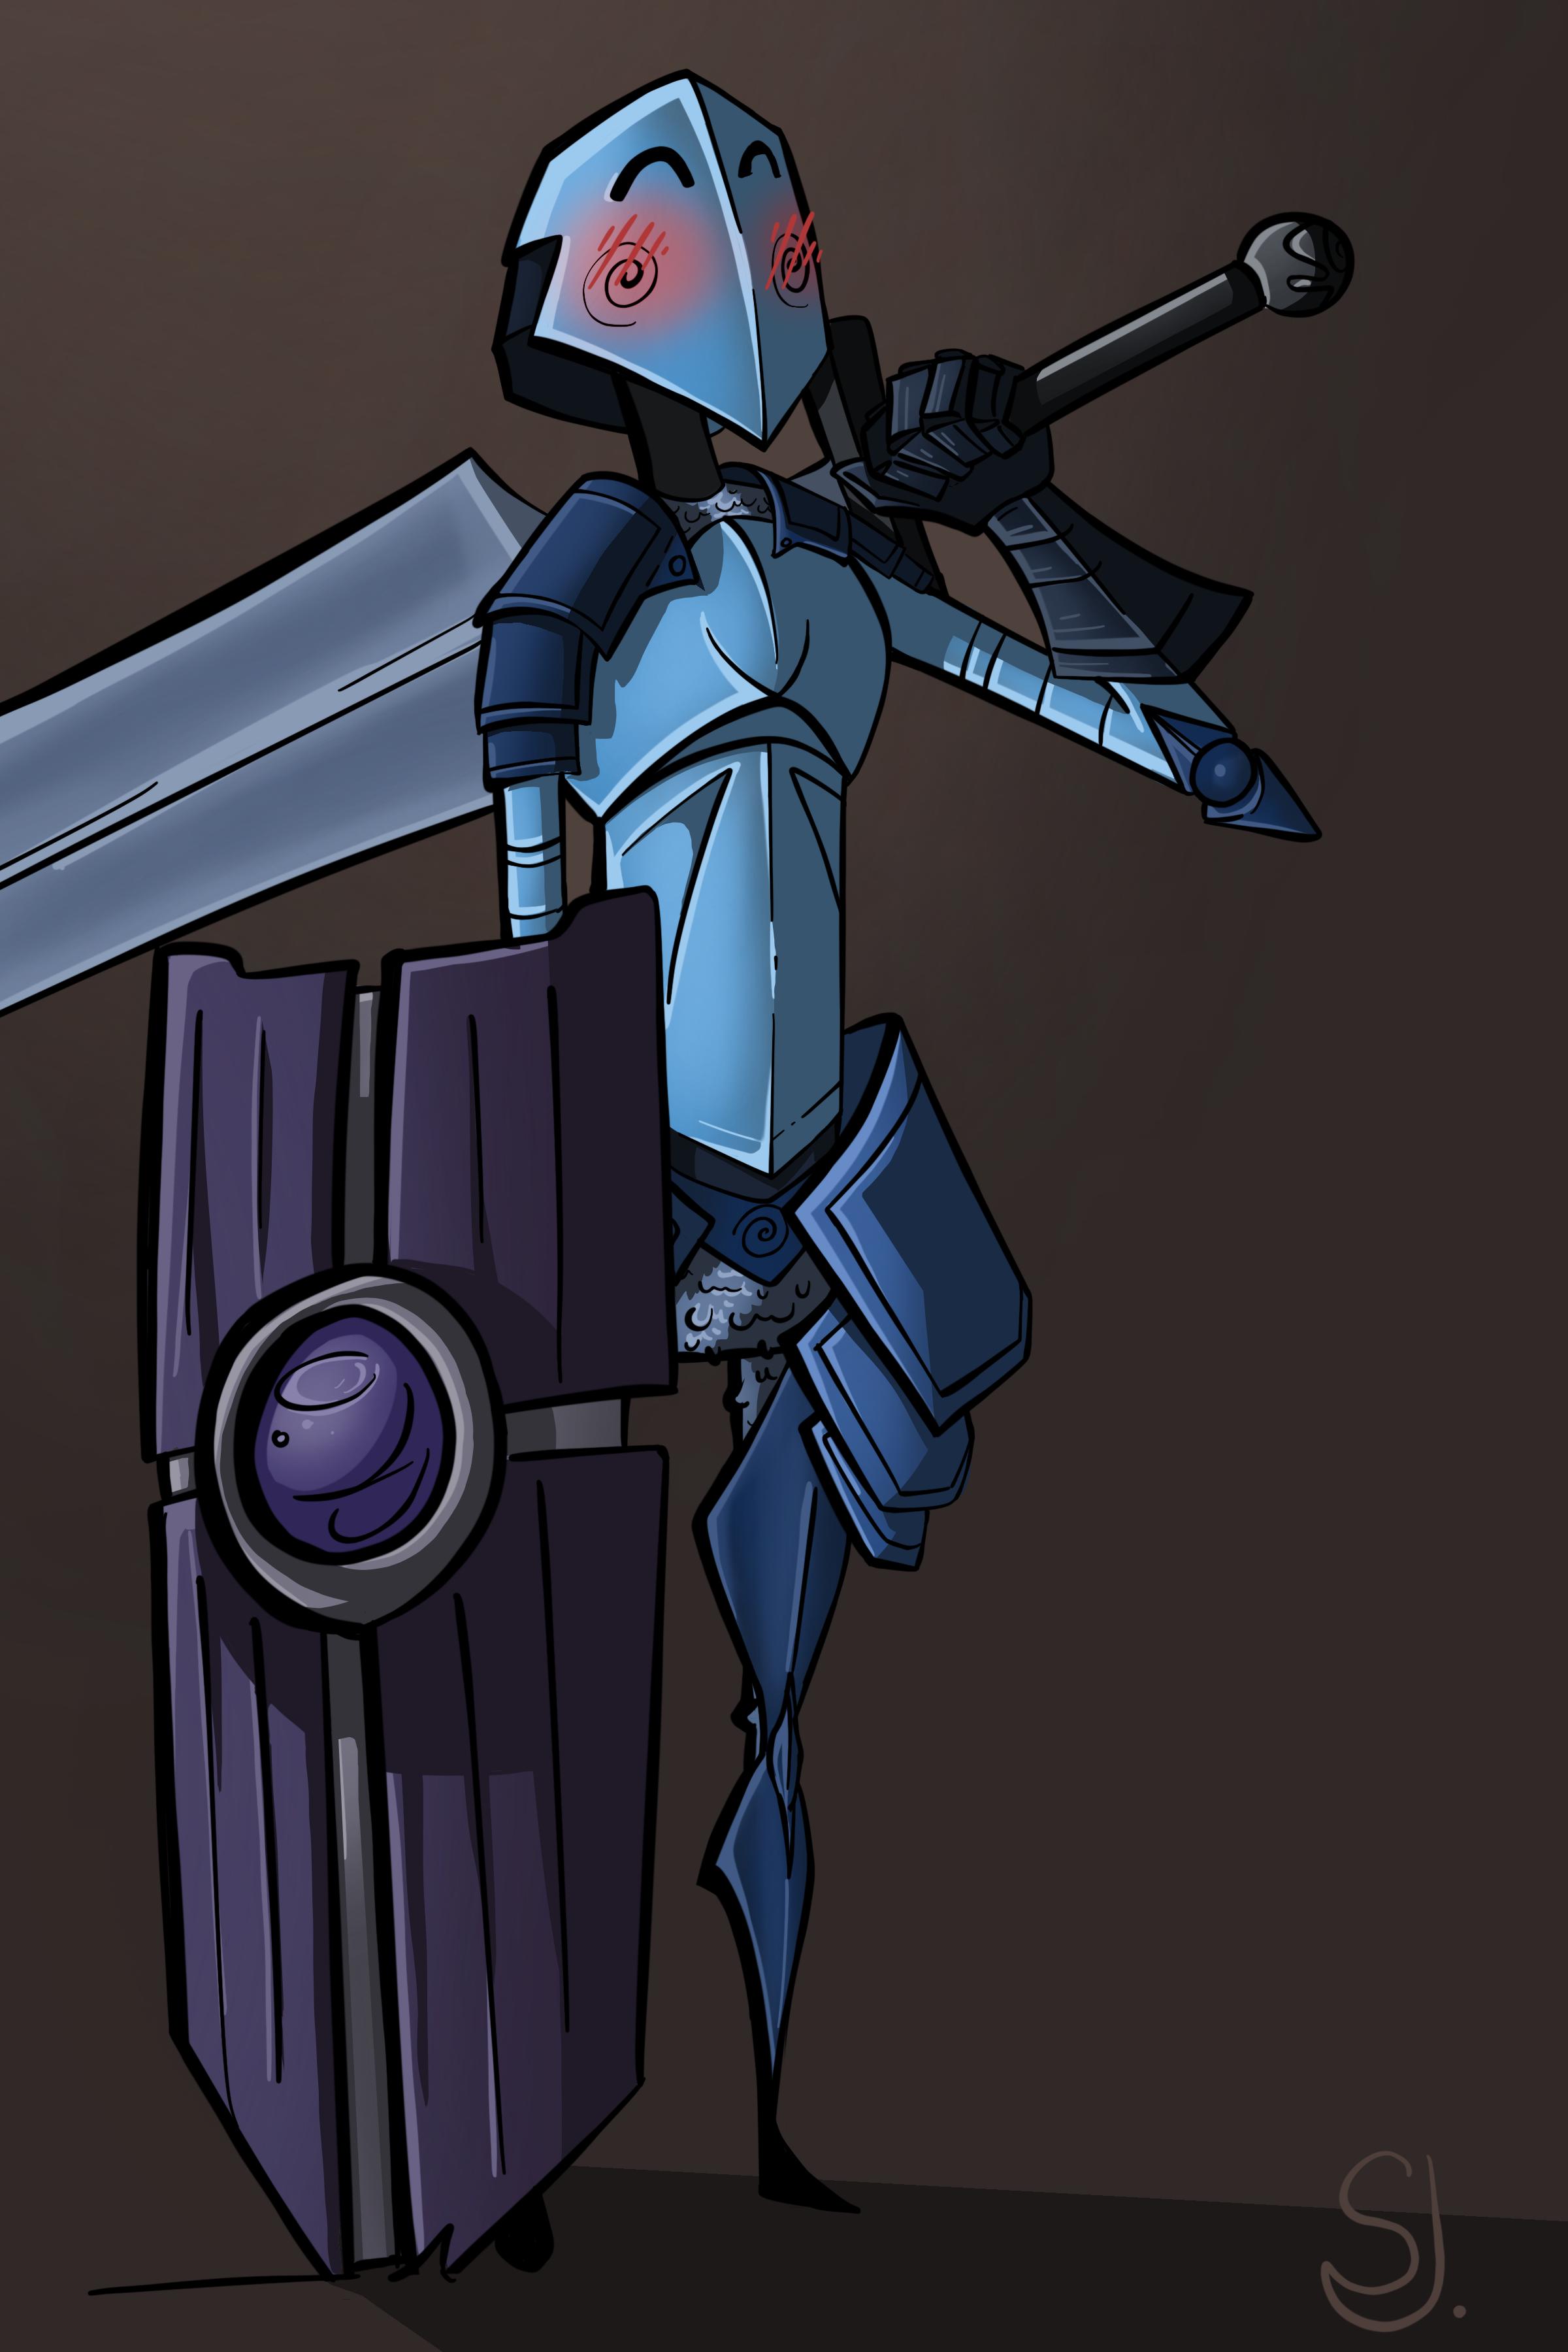 Simple, cute knight